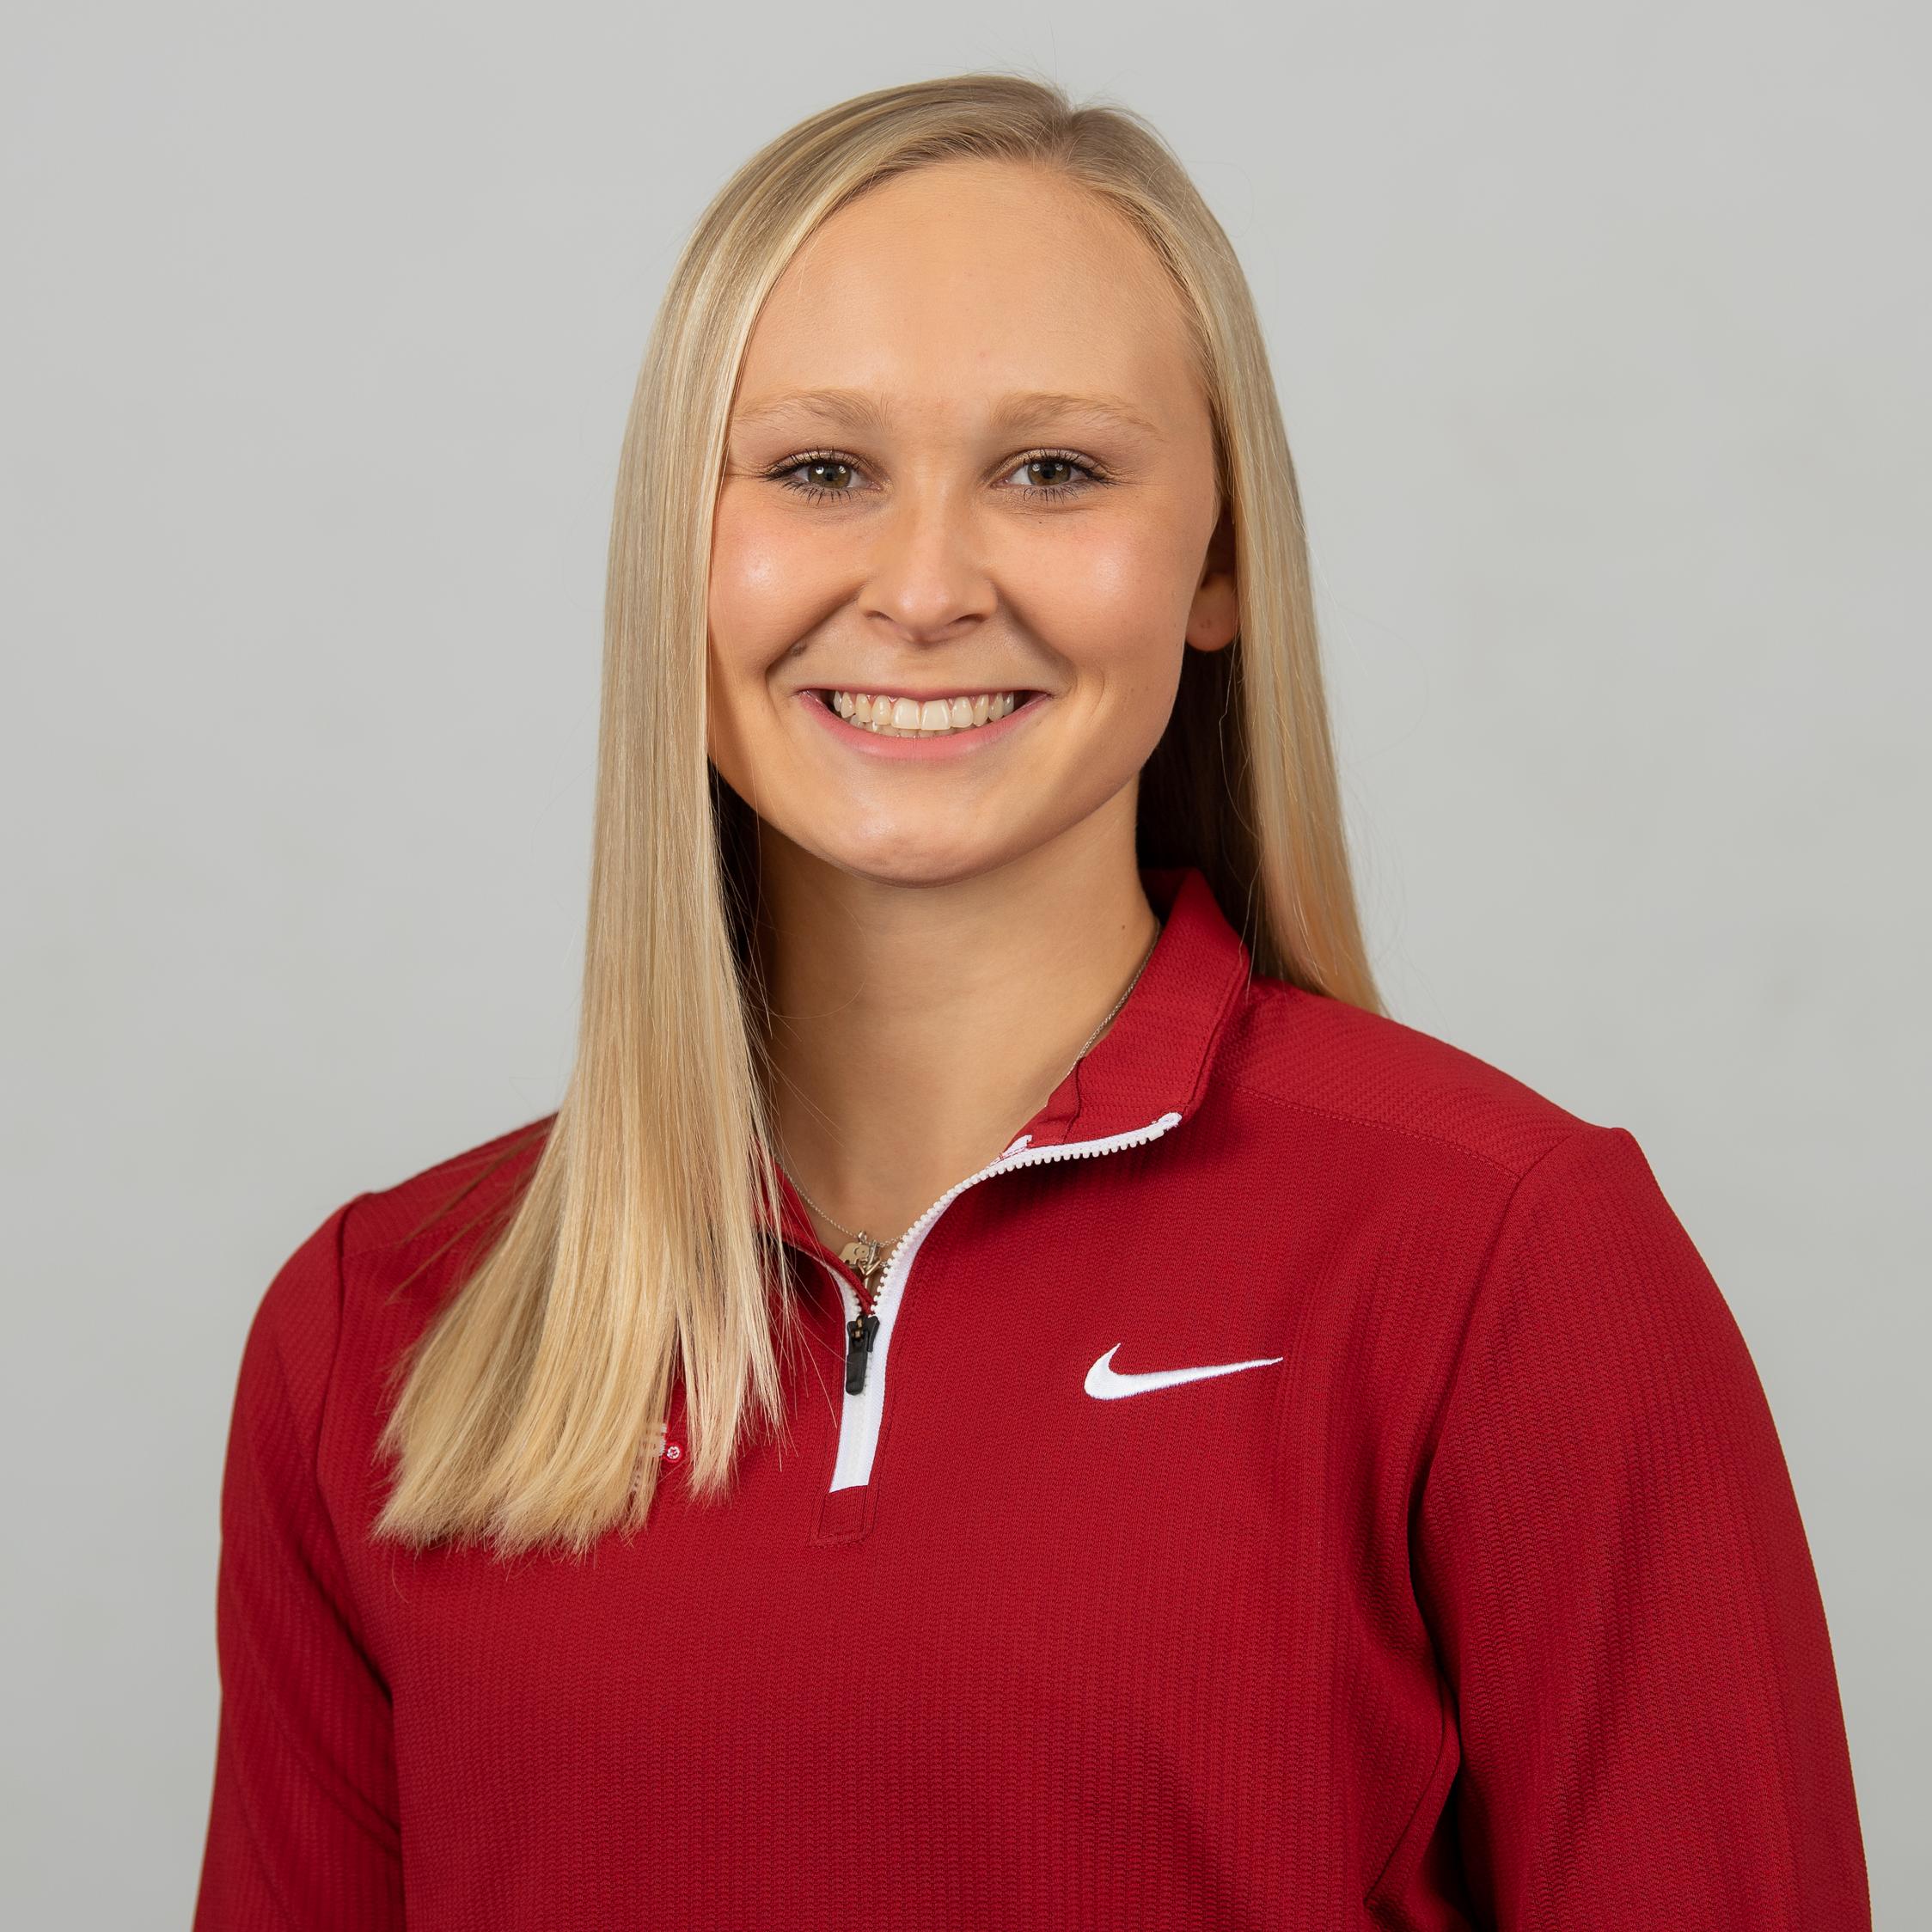 Maggie O'Hara - Gymnastics - Arkansas Razorbacks